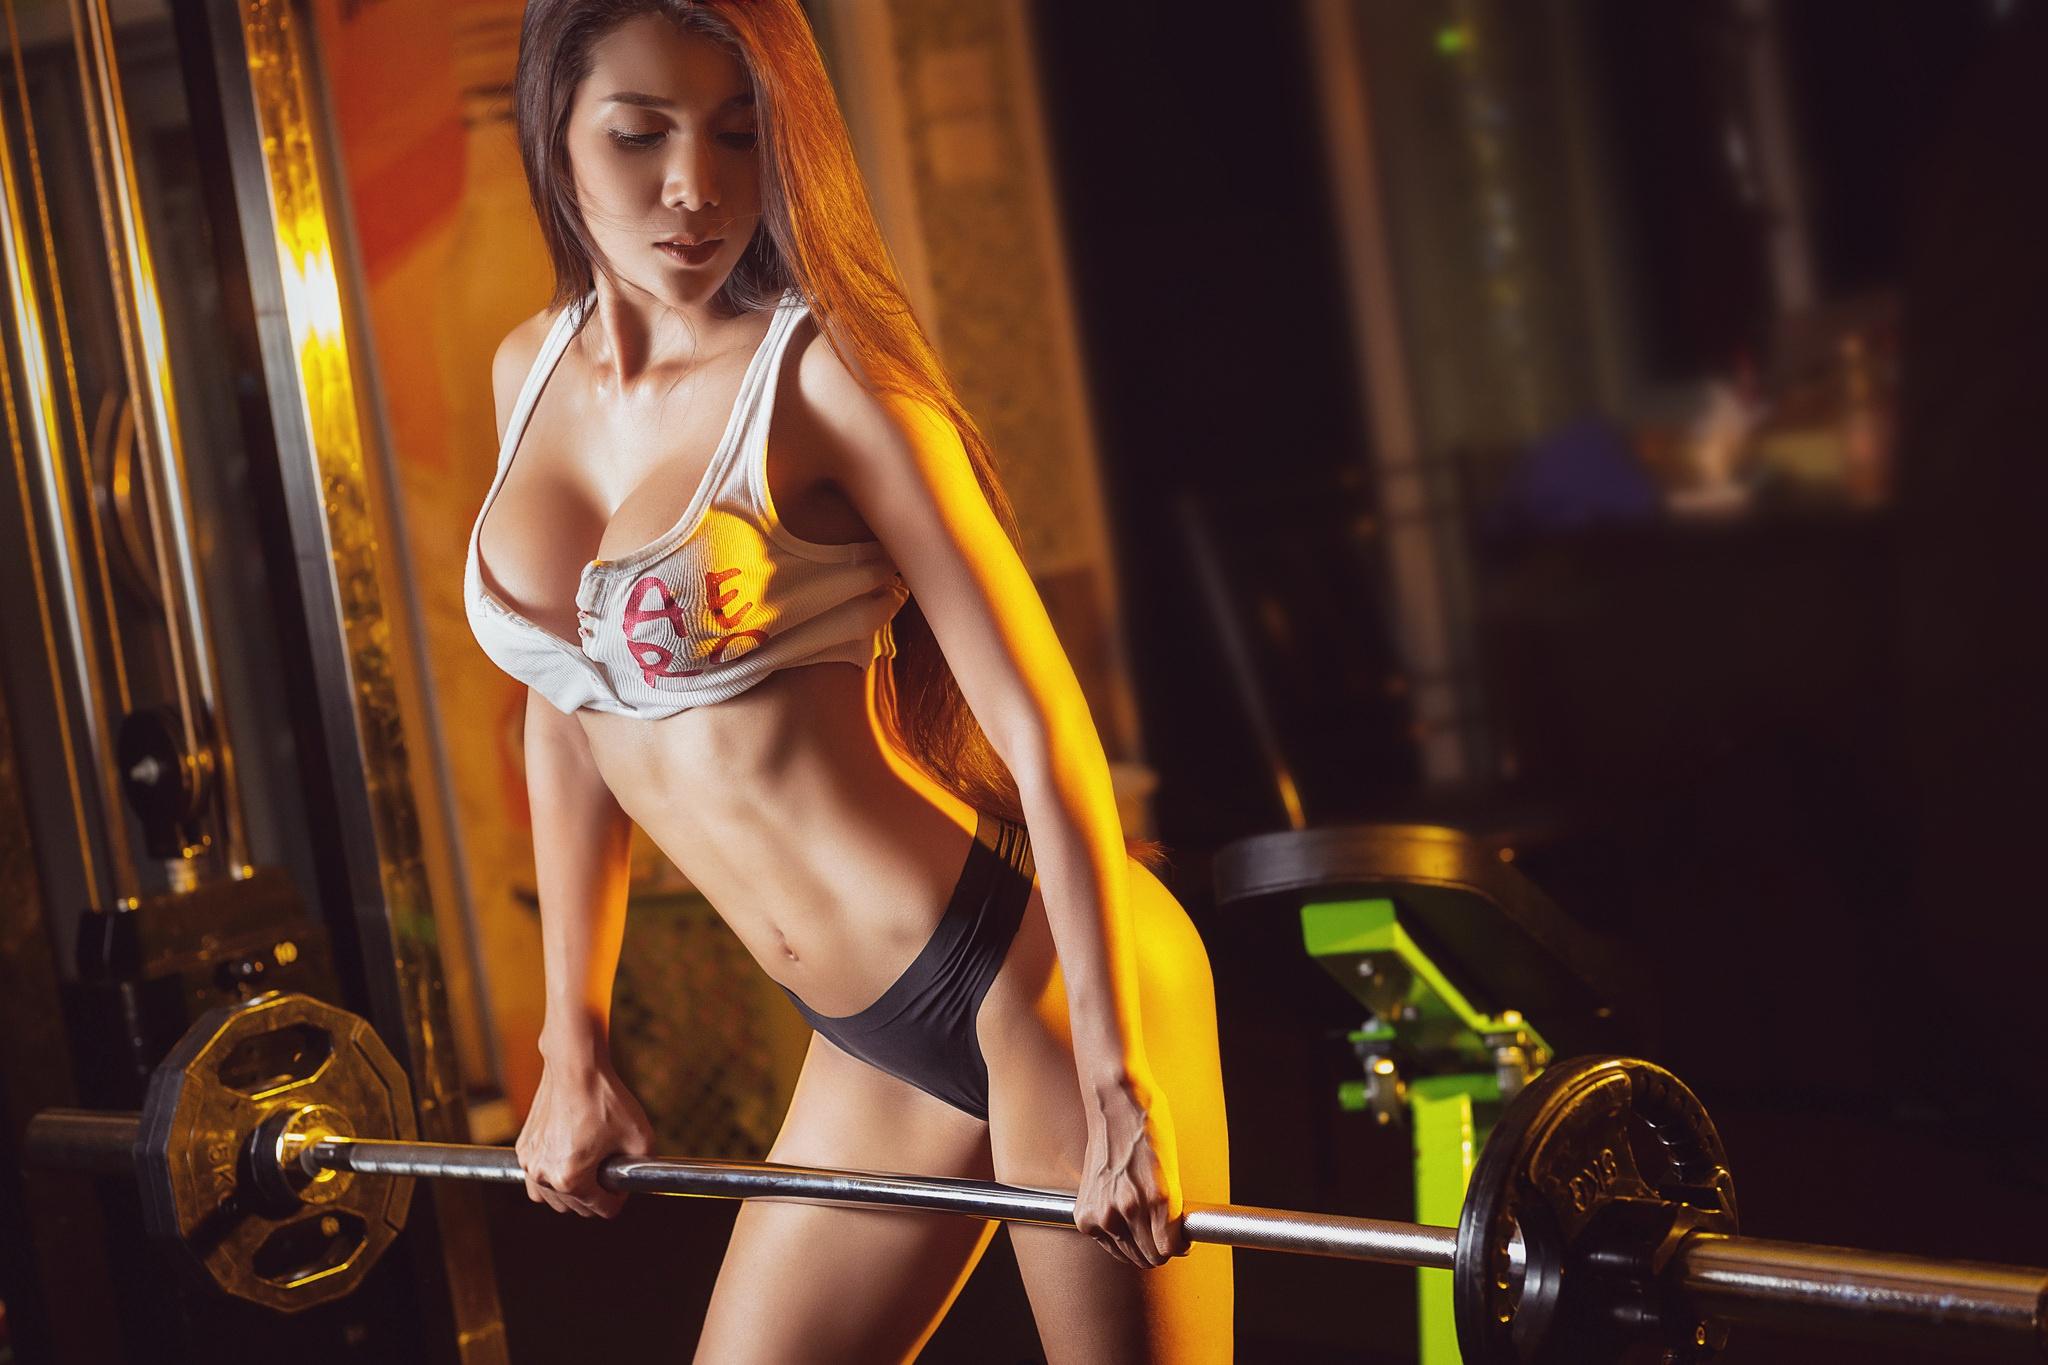 Wallpaper Dumbbells Asian Women Working Out Panties